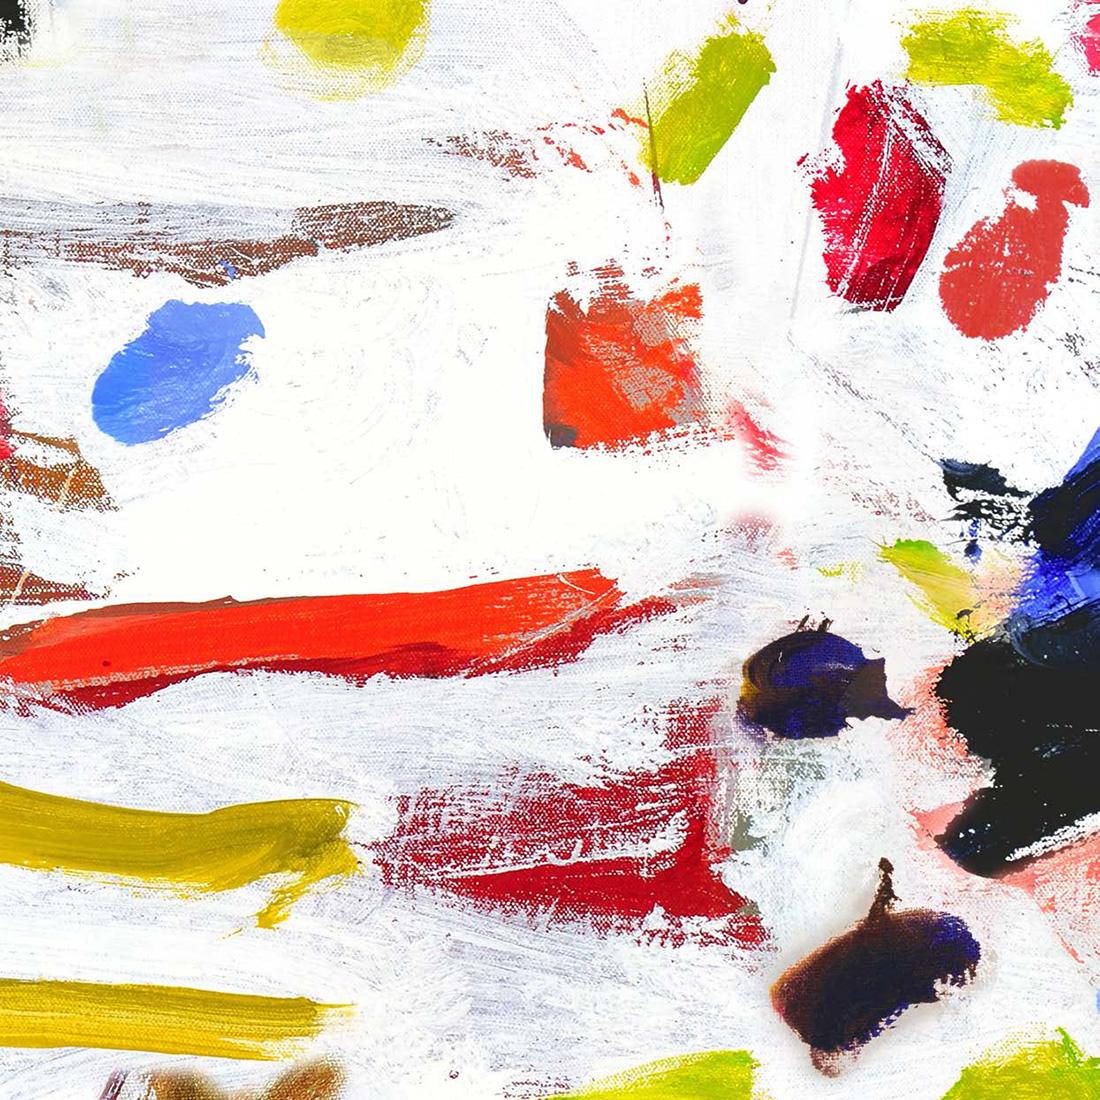 Carta da parati contemporanea Pierre Frey Les Dessins 2 Arty Multicolor FP444001 ambientazione AERREe